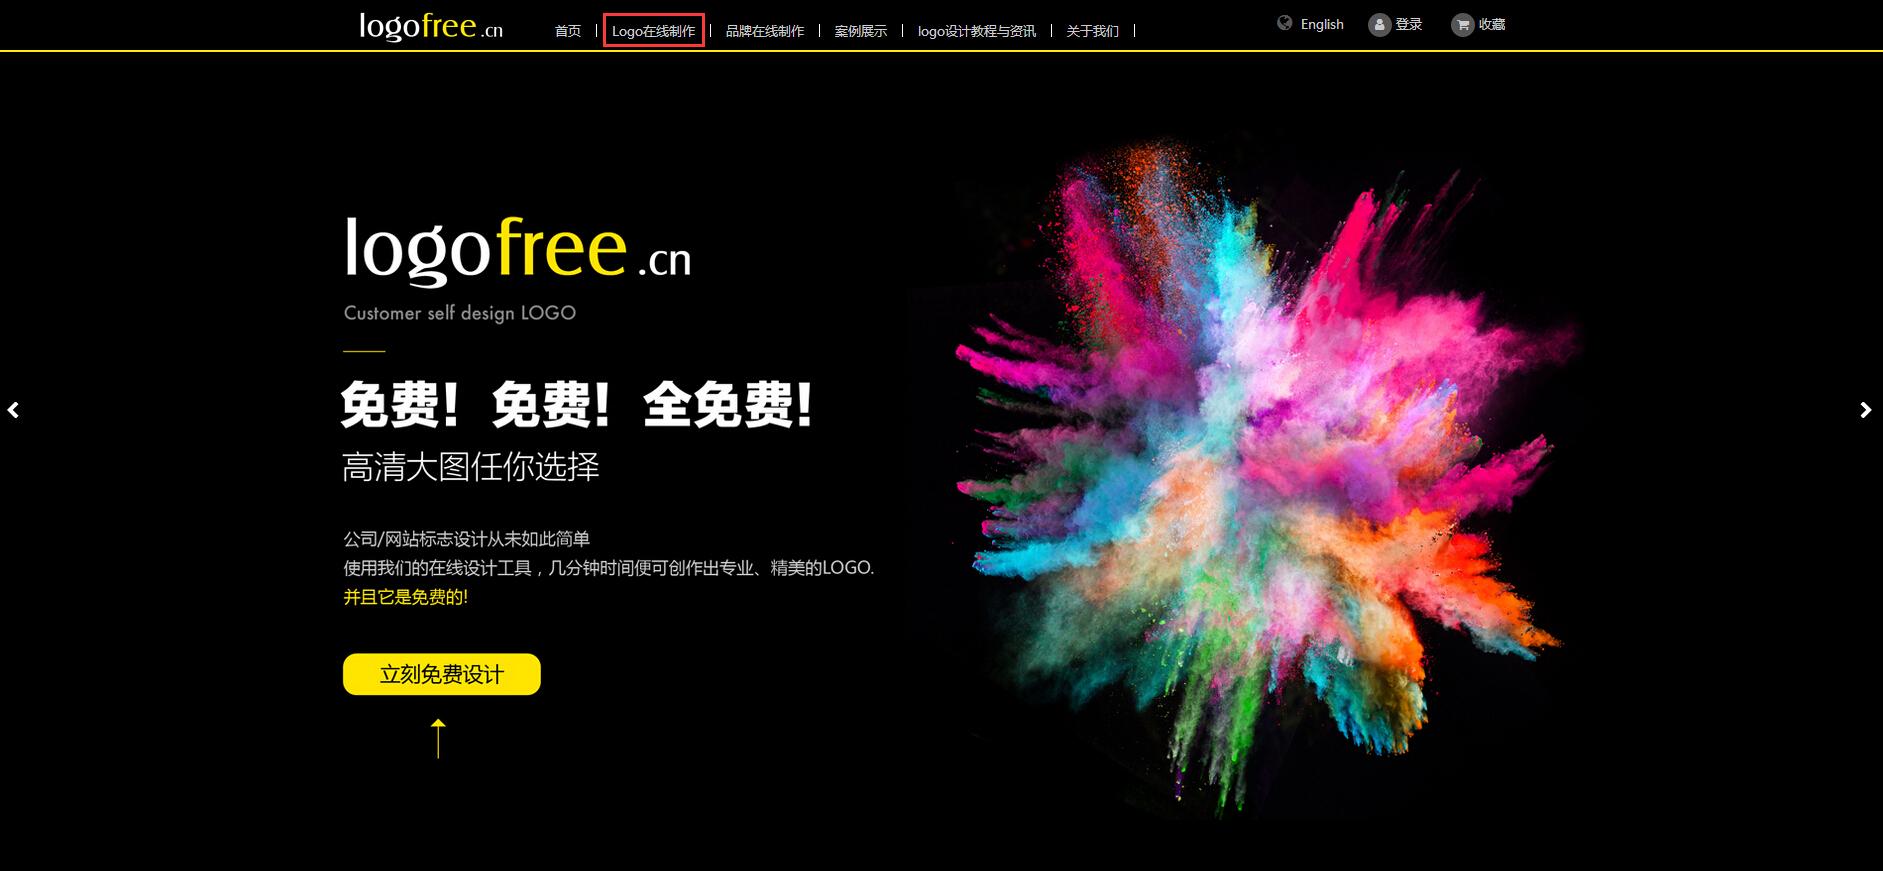 logo在线制作http://www.logofree.cn